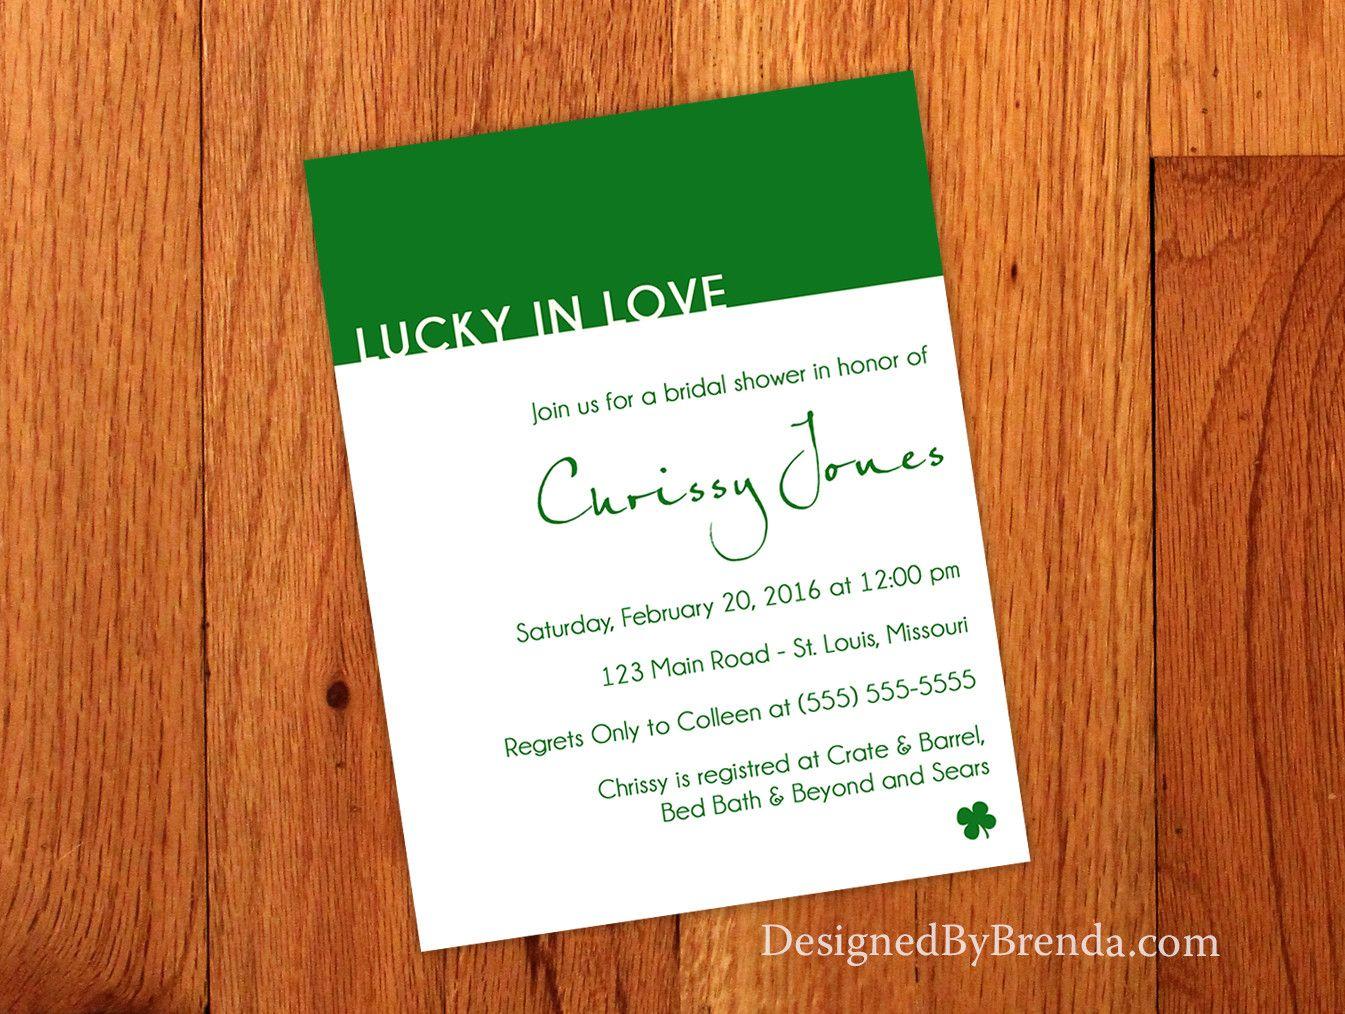 Modern Lucky in Love Wedding Shower Invitation - Kelly Green